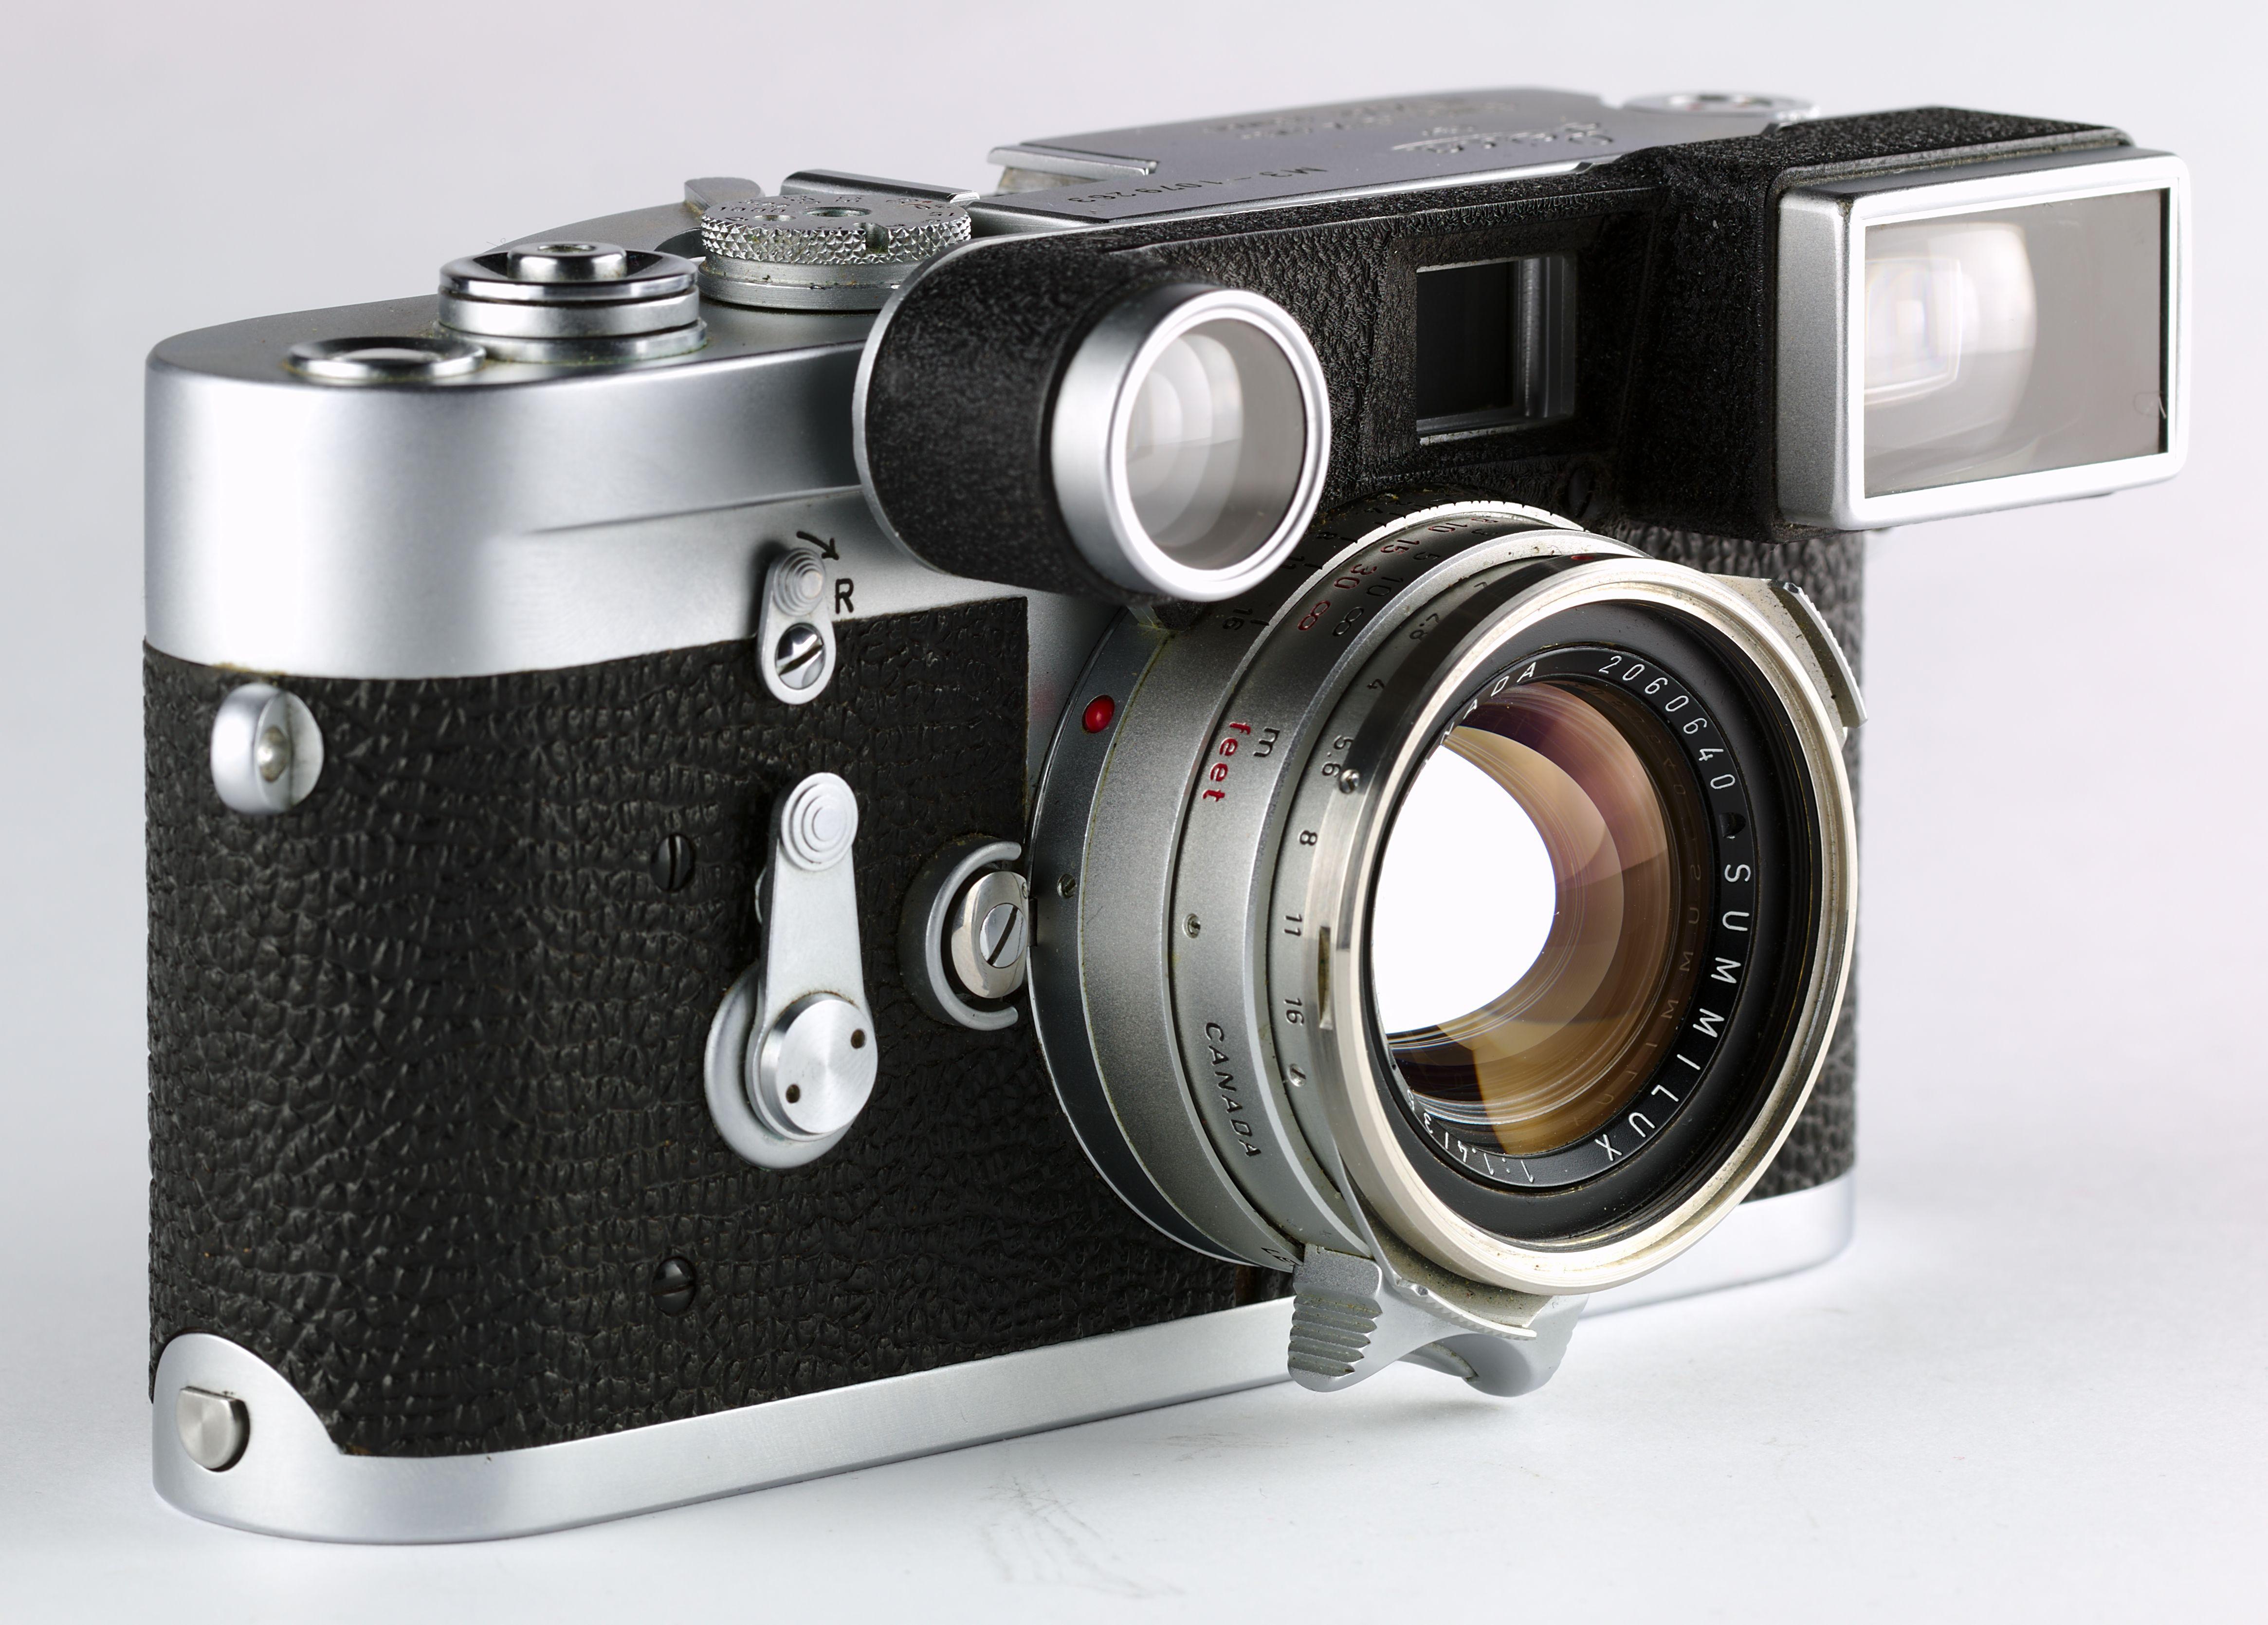 Leica_M3_with_35mm_lens.jpg (4660×3338)